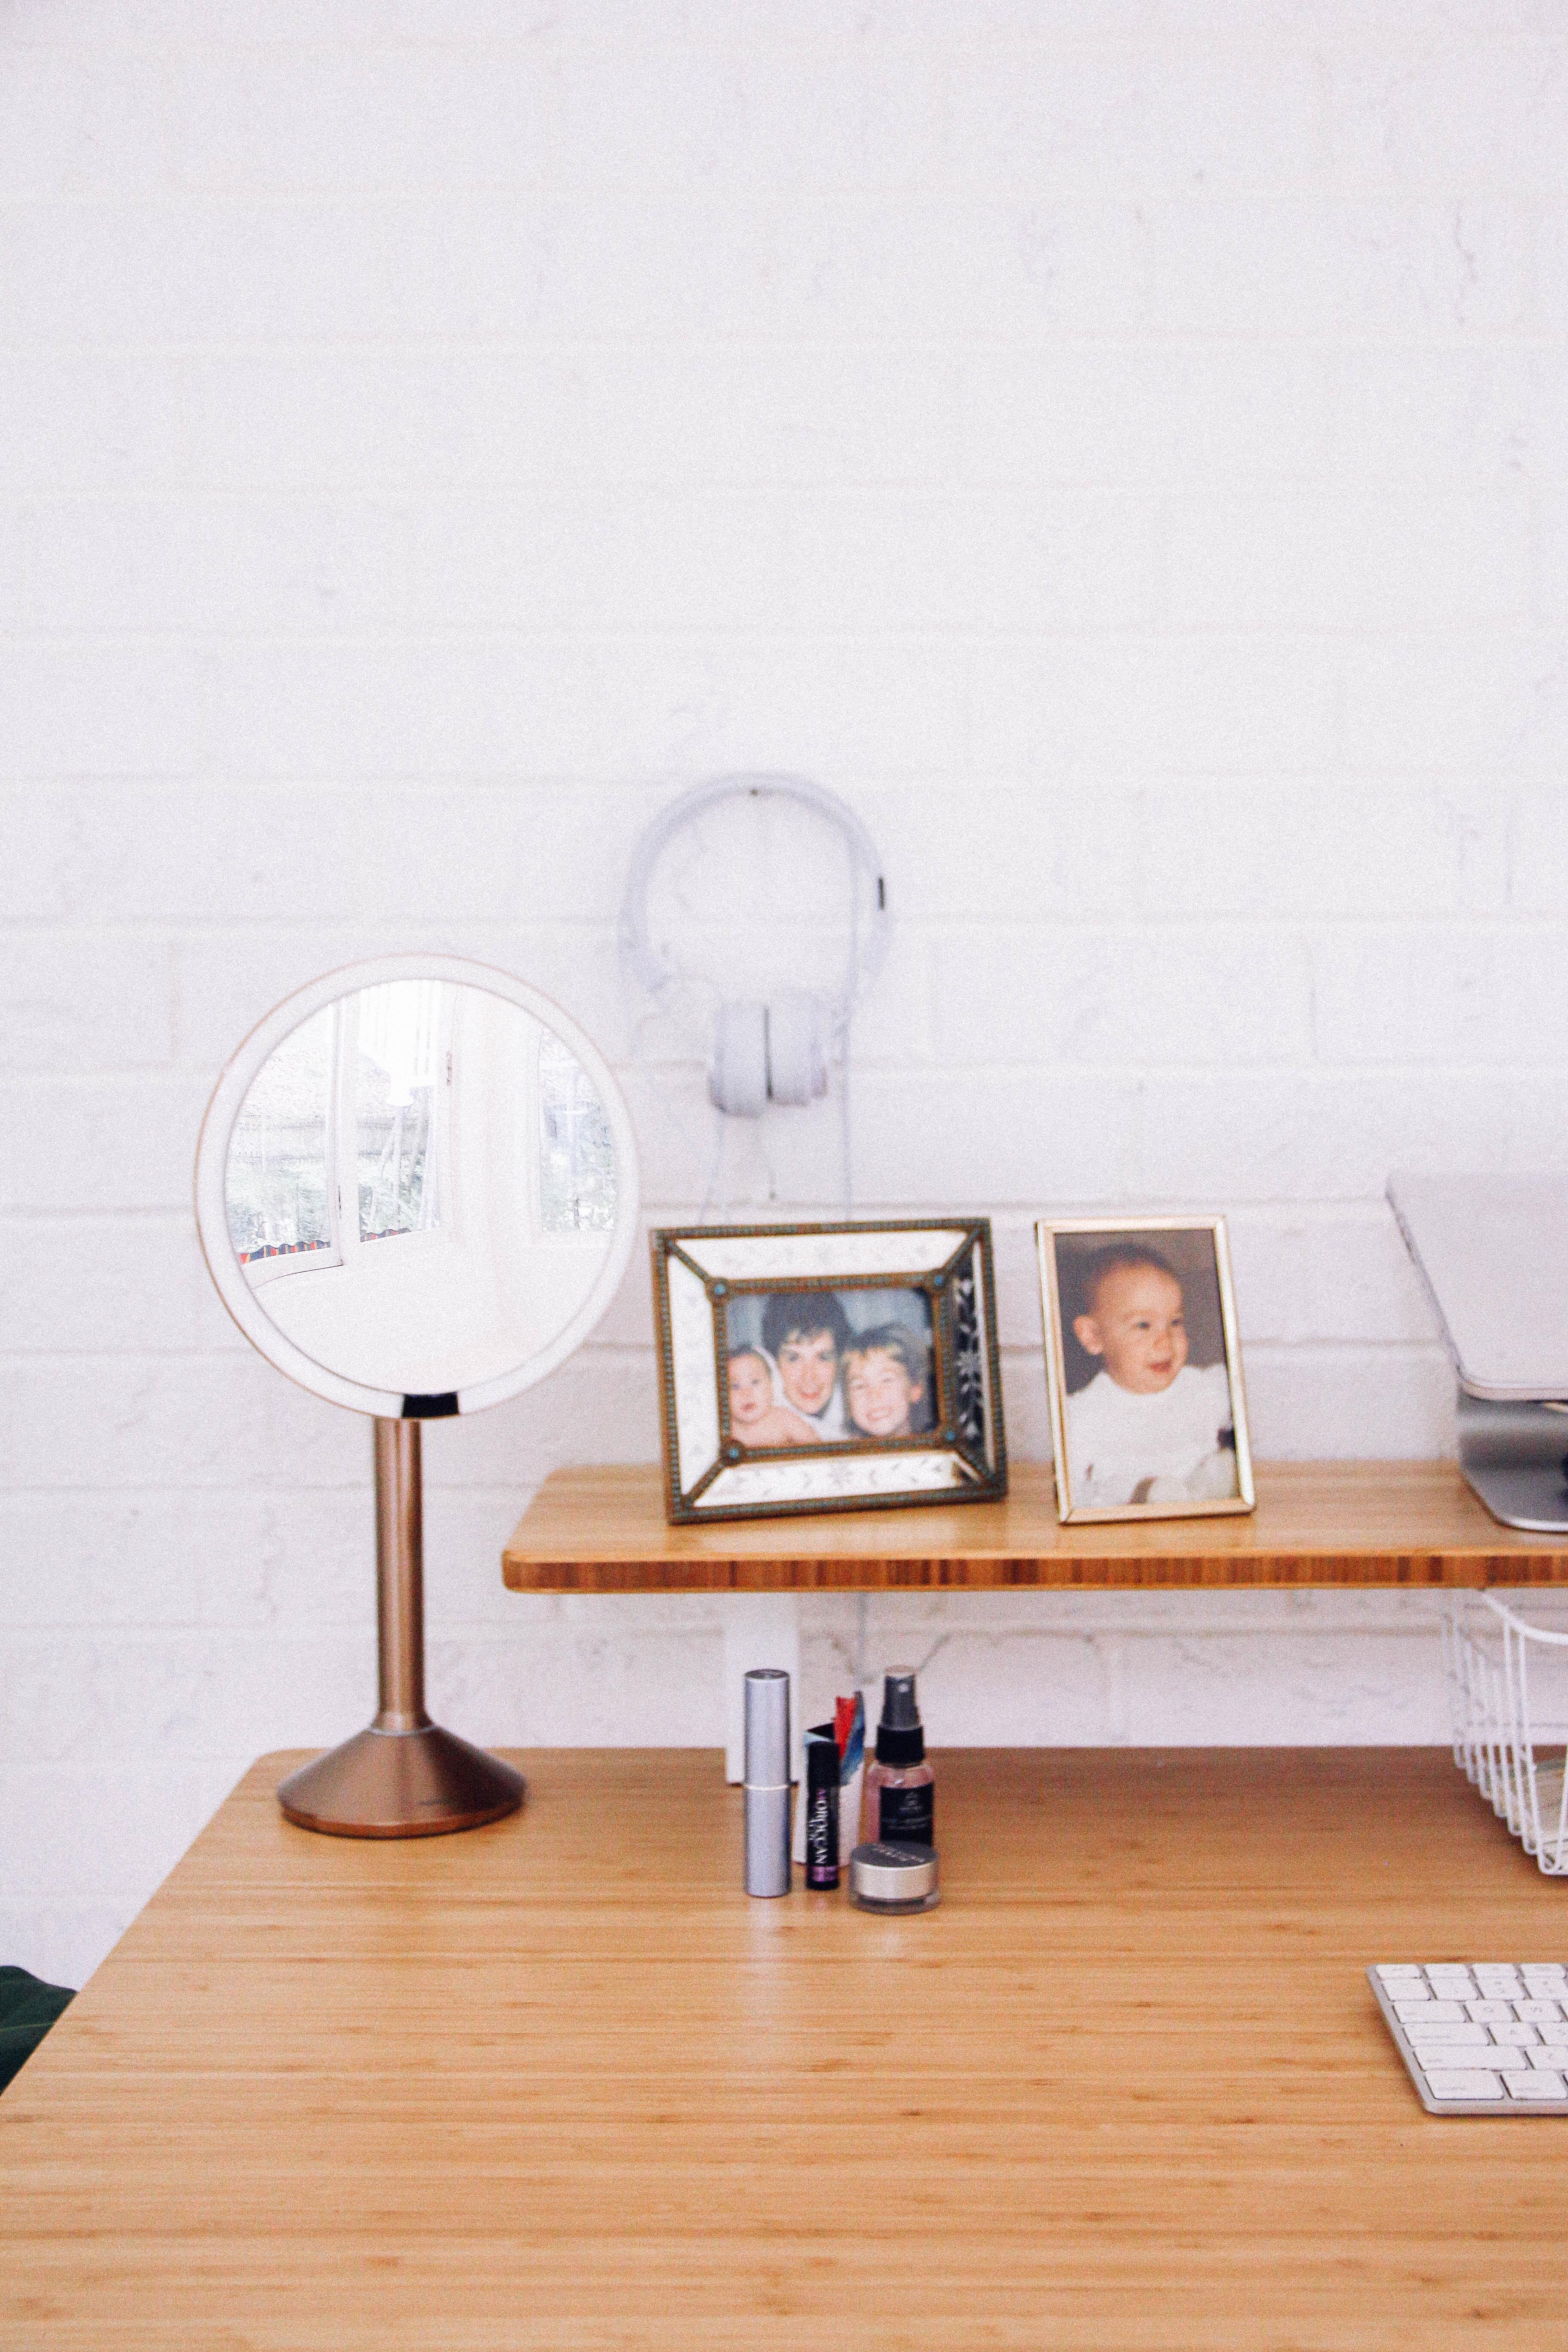 Jarvis Bamboo Standing Desk: of My Dreams – hullosam